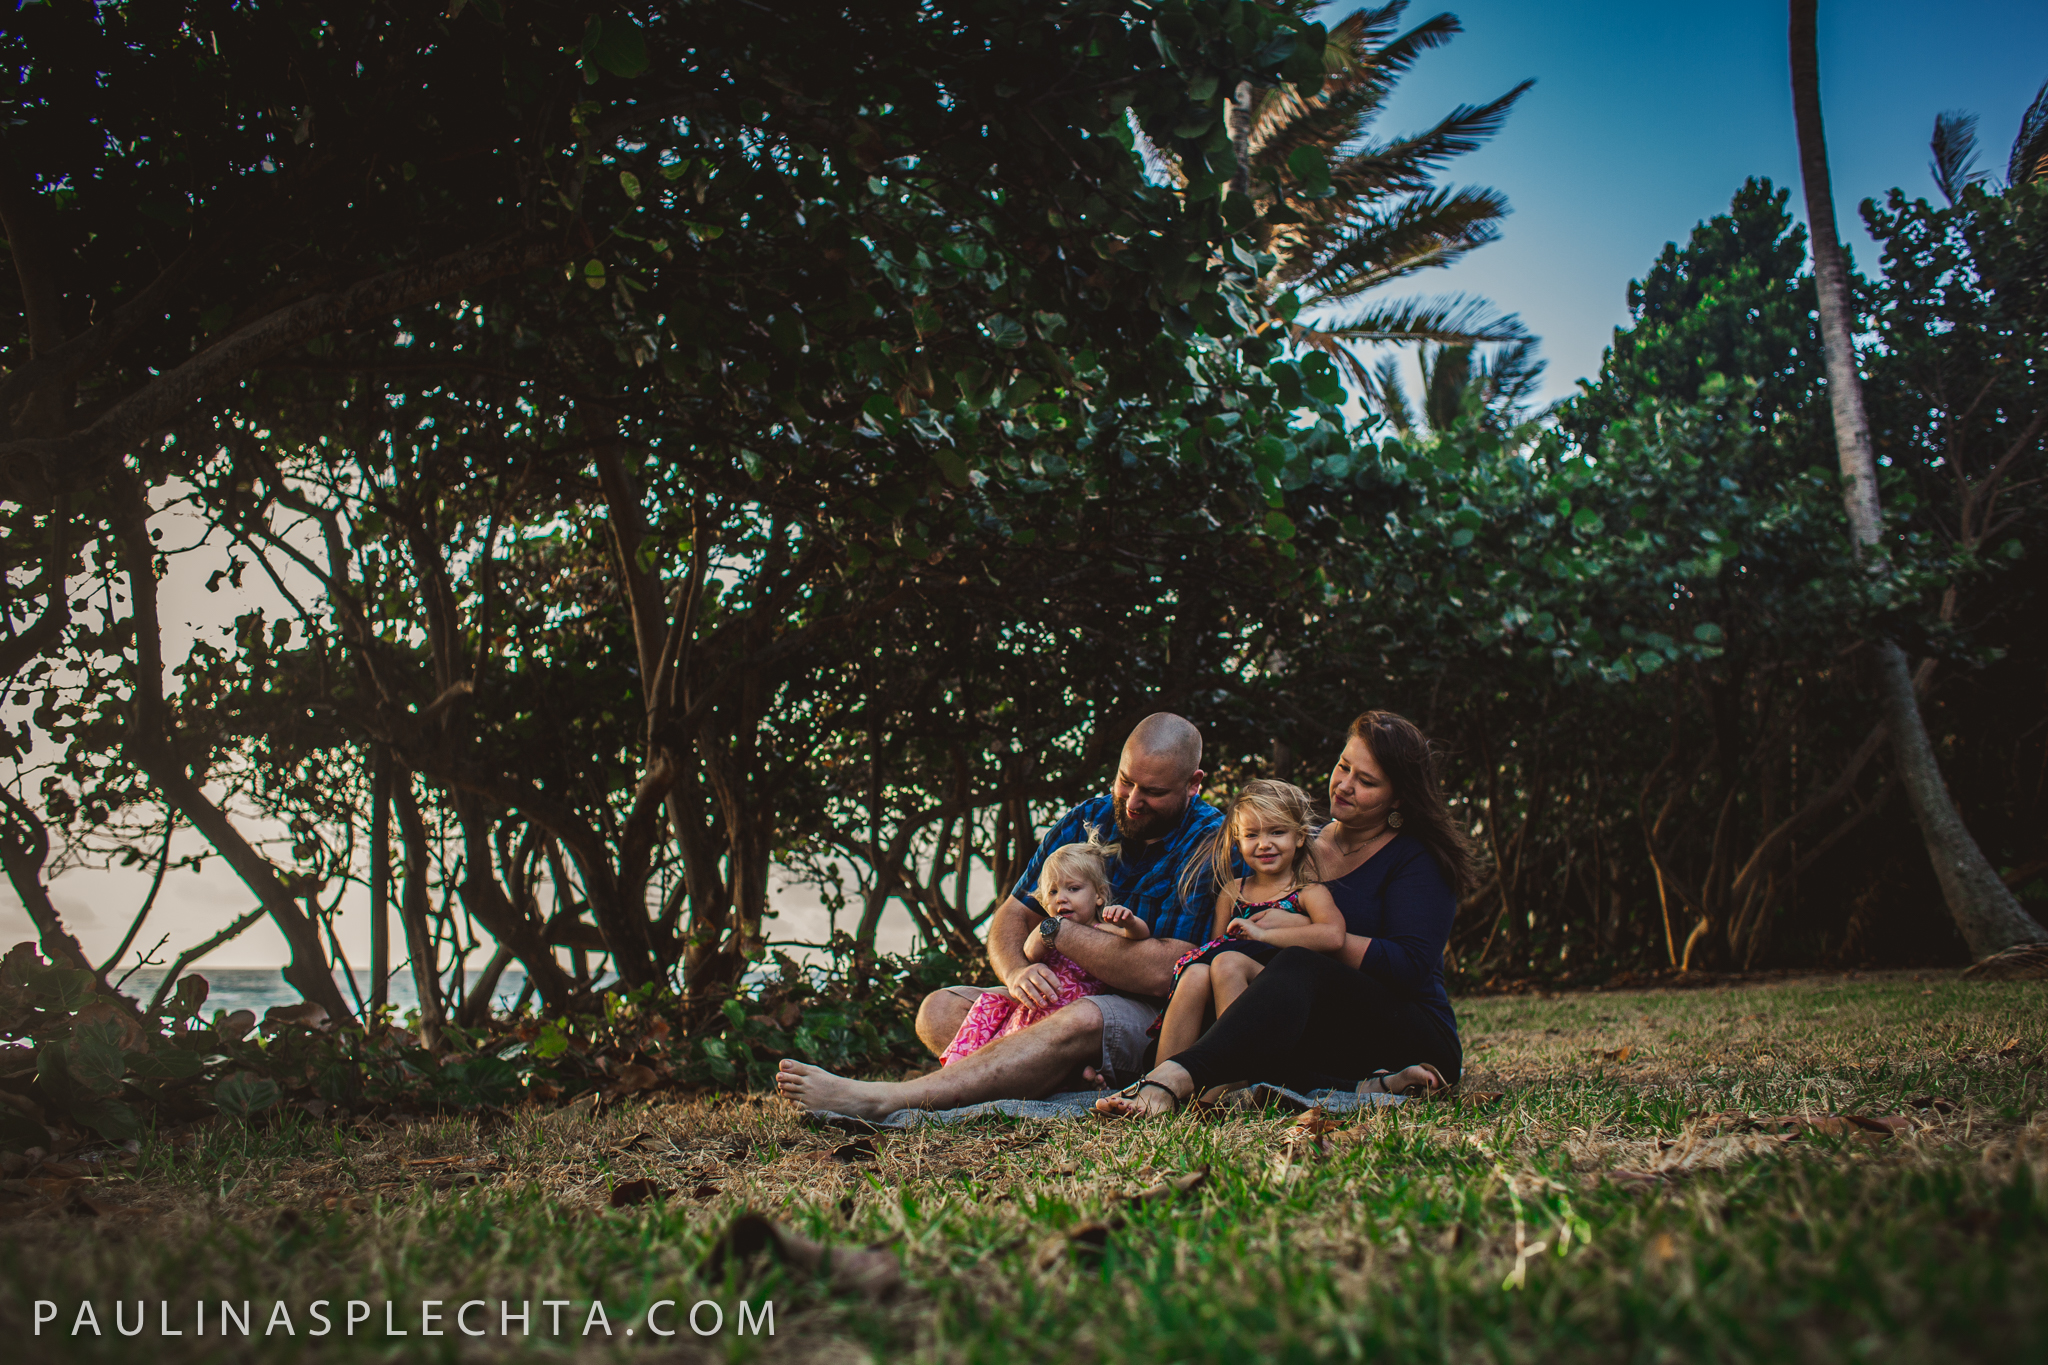 Family Photographer South Florida Pompano Broward Palm Beach Babies Baby Newborn Breastfeeding Birth Photograpy Beach Home Documentary Session-72.jpg